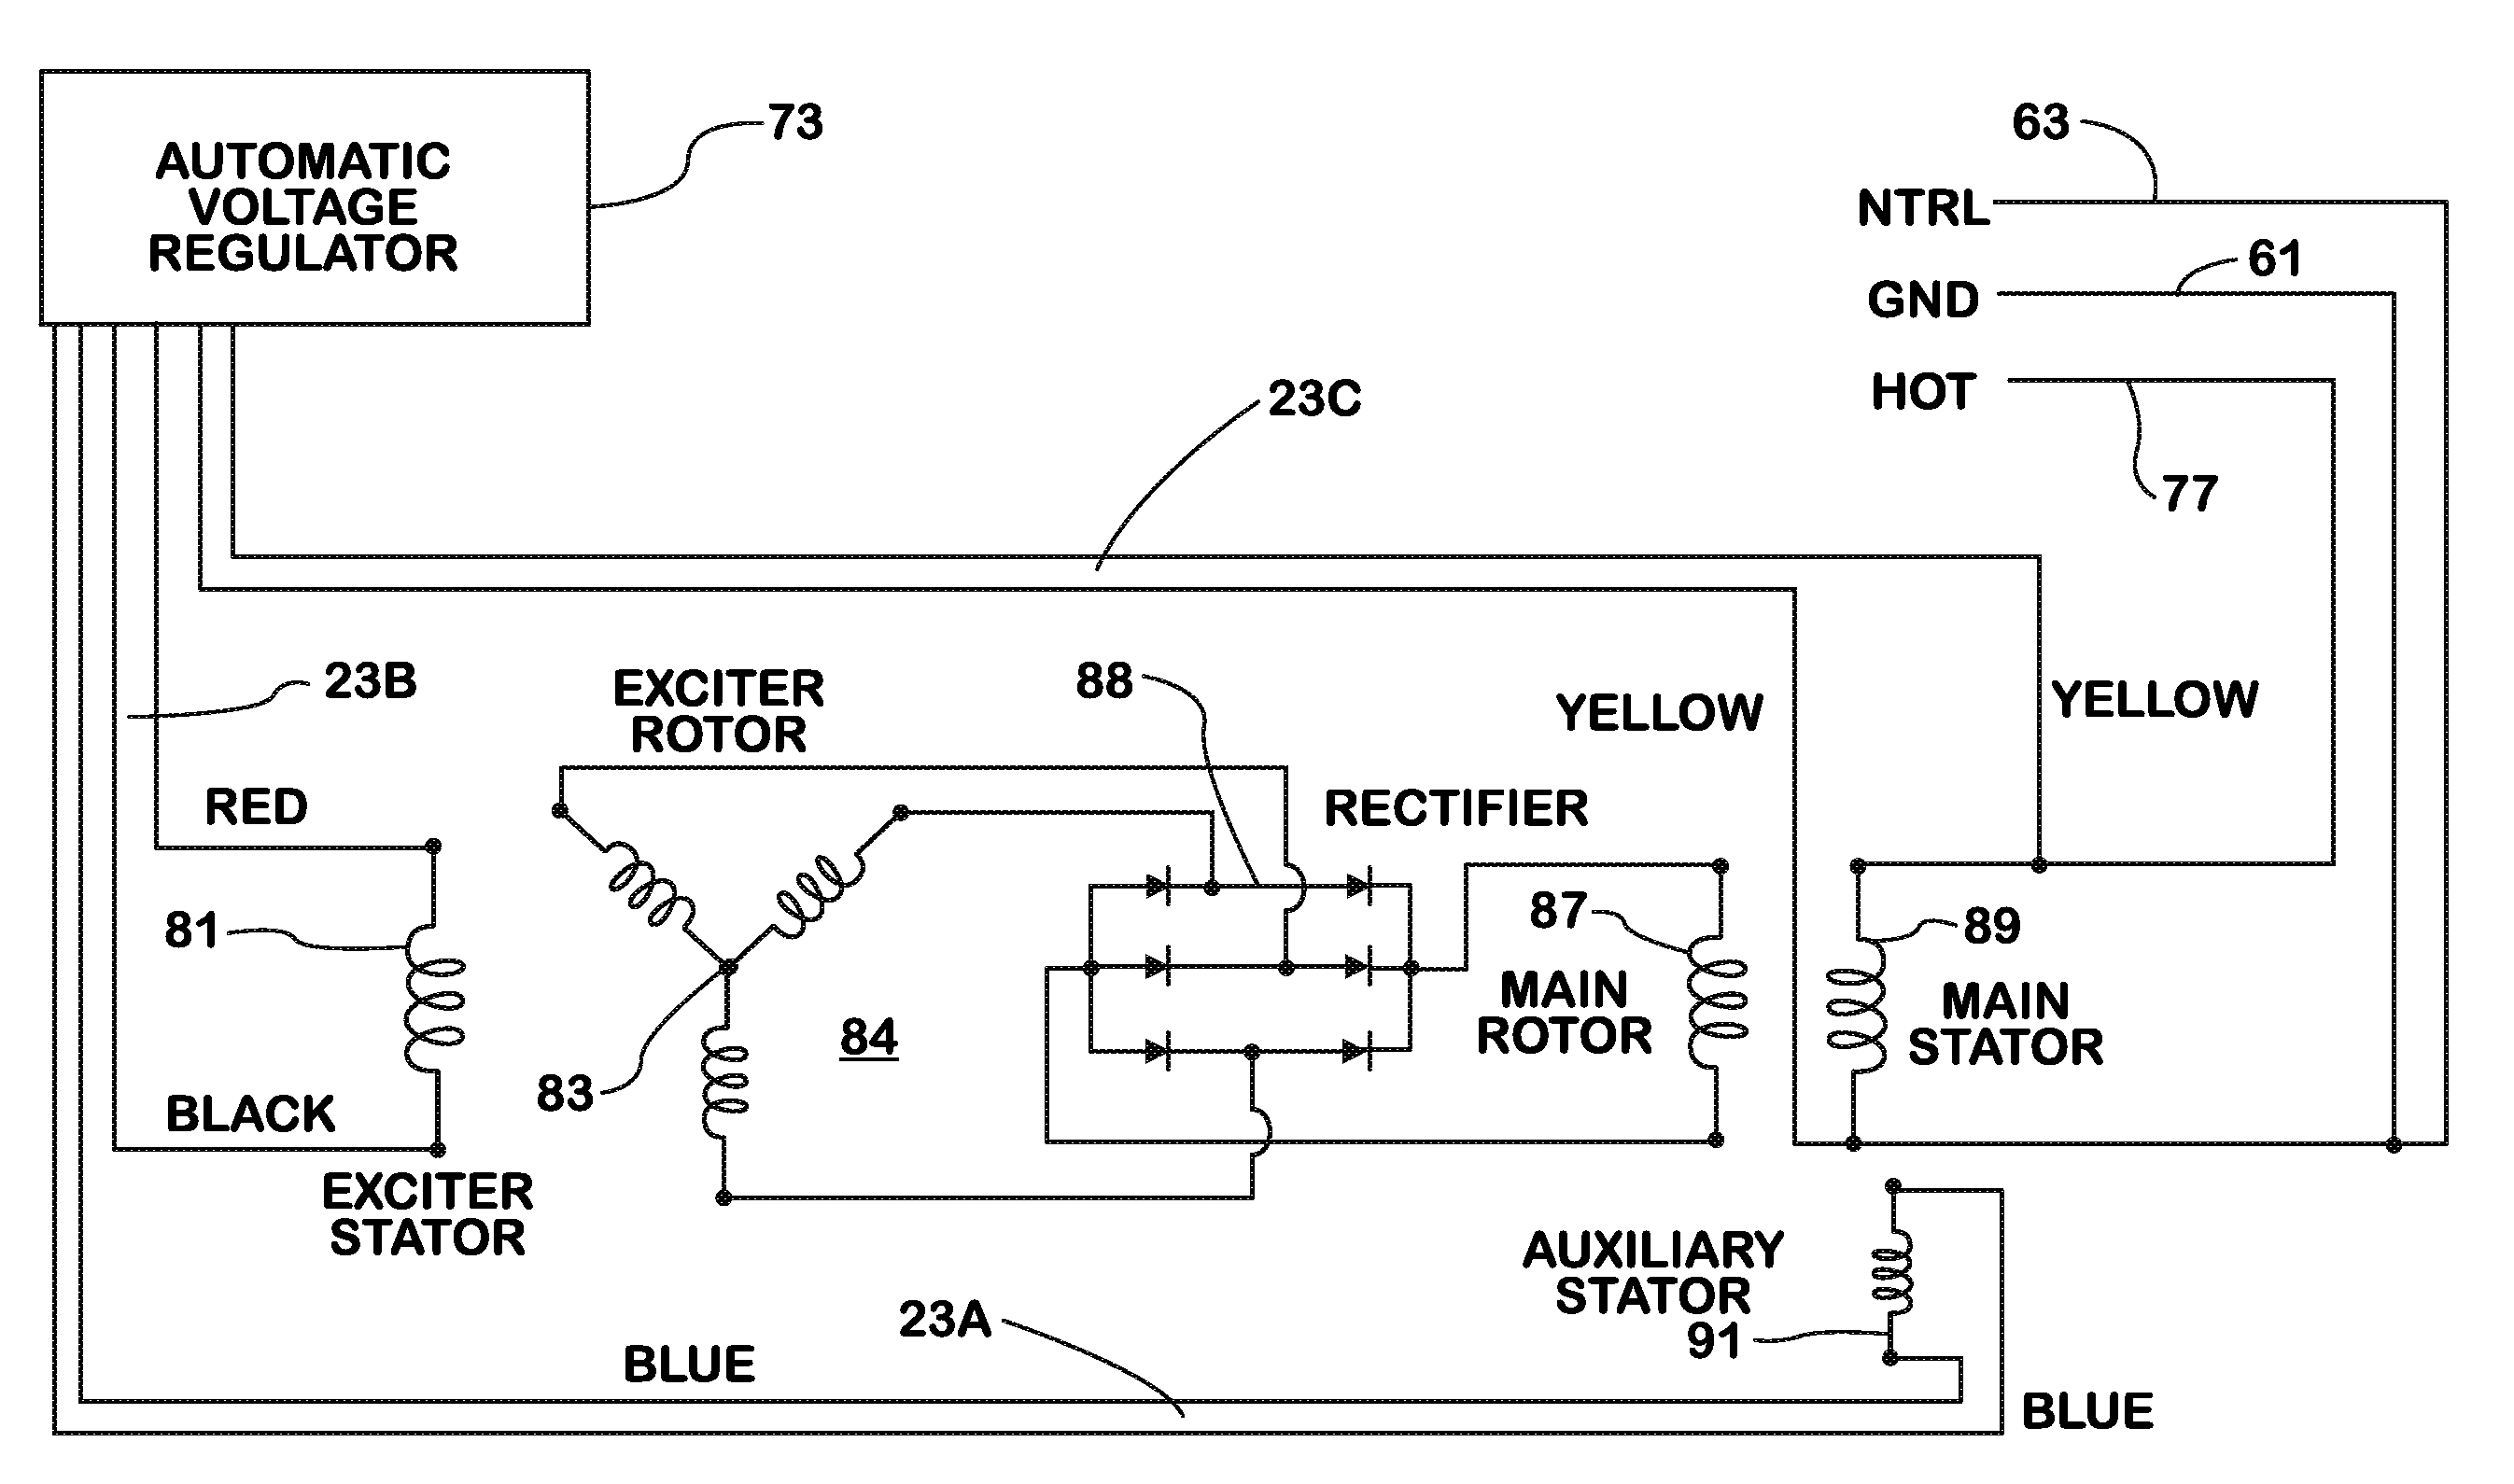 Unique Wiring Diagram For Car Generator Diagram Diagramtemplate Diagramsample Check More At Https Servisi Co Wirin Diagram Voltage Regulator Diagram Chart